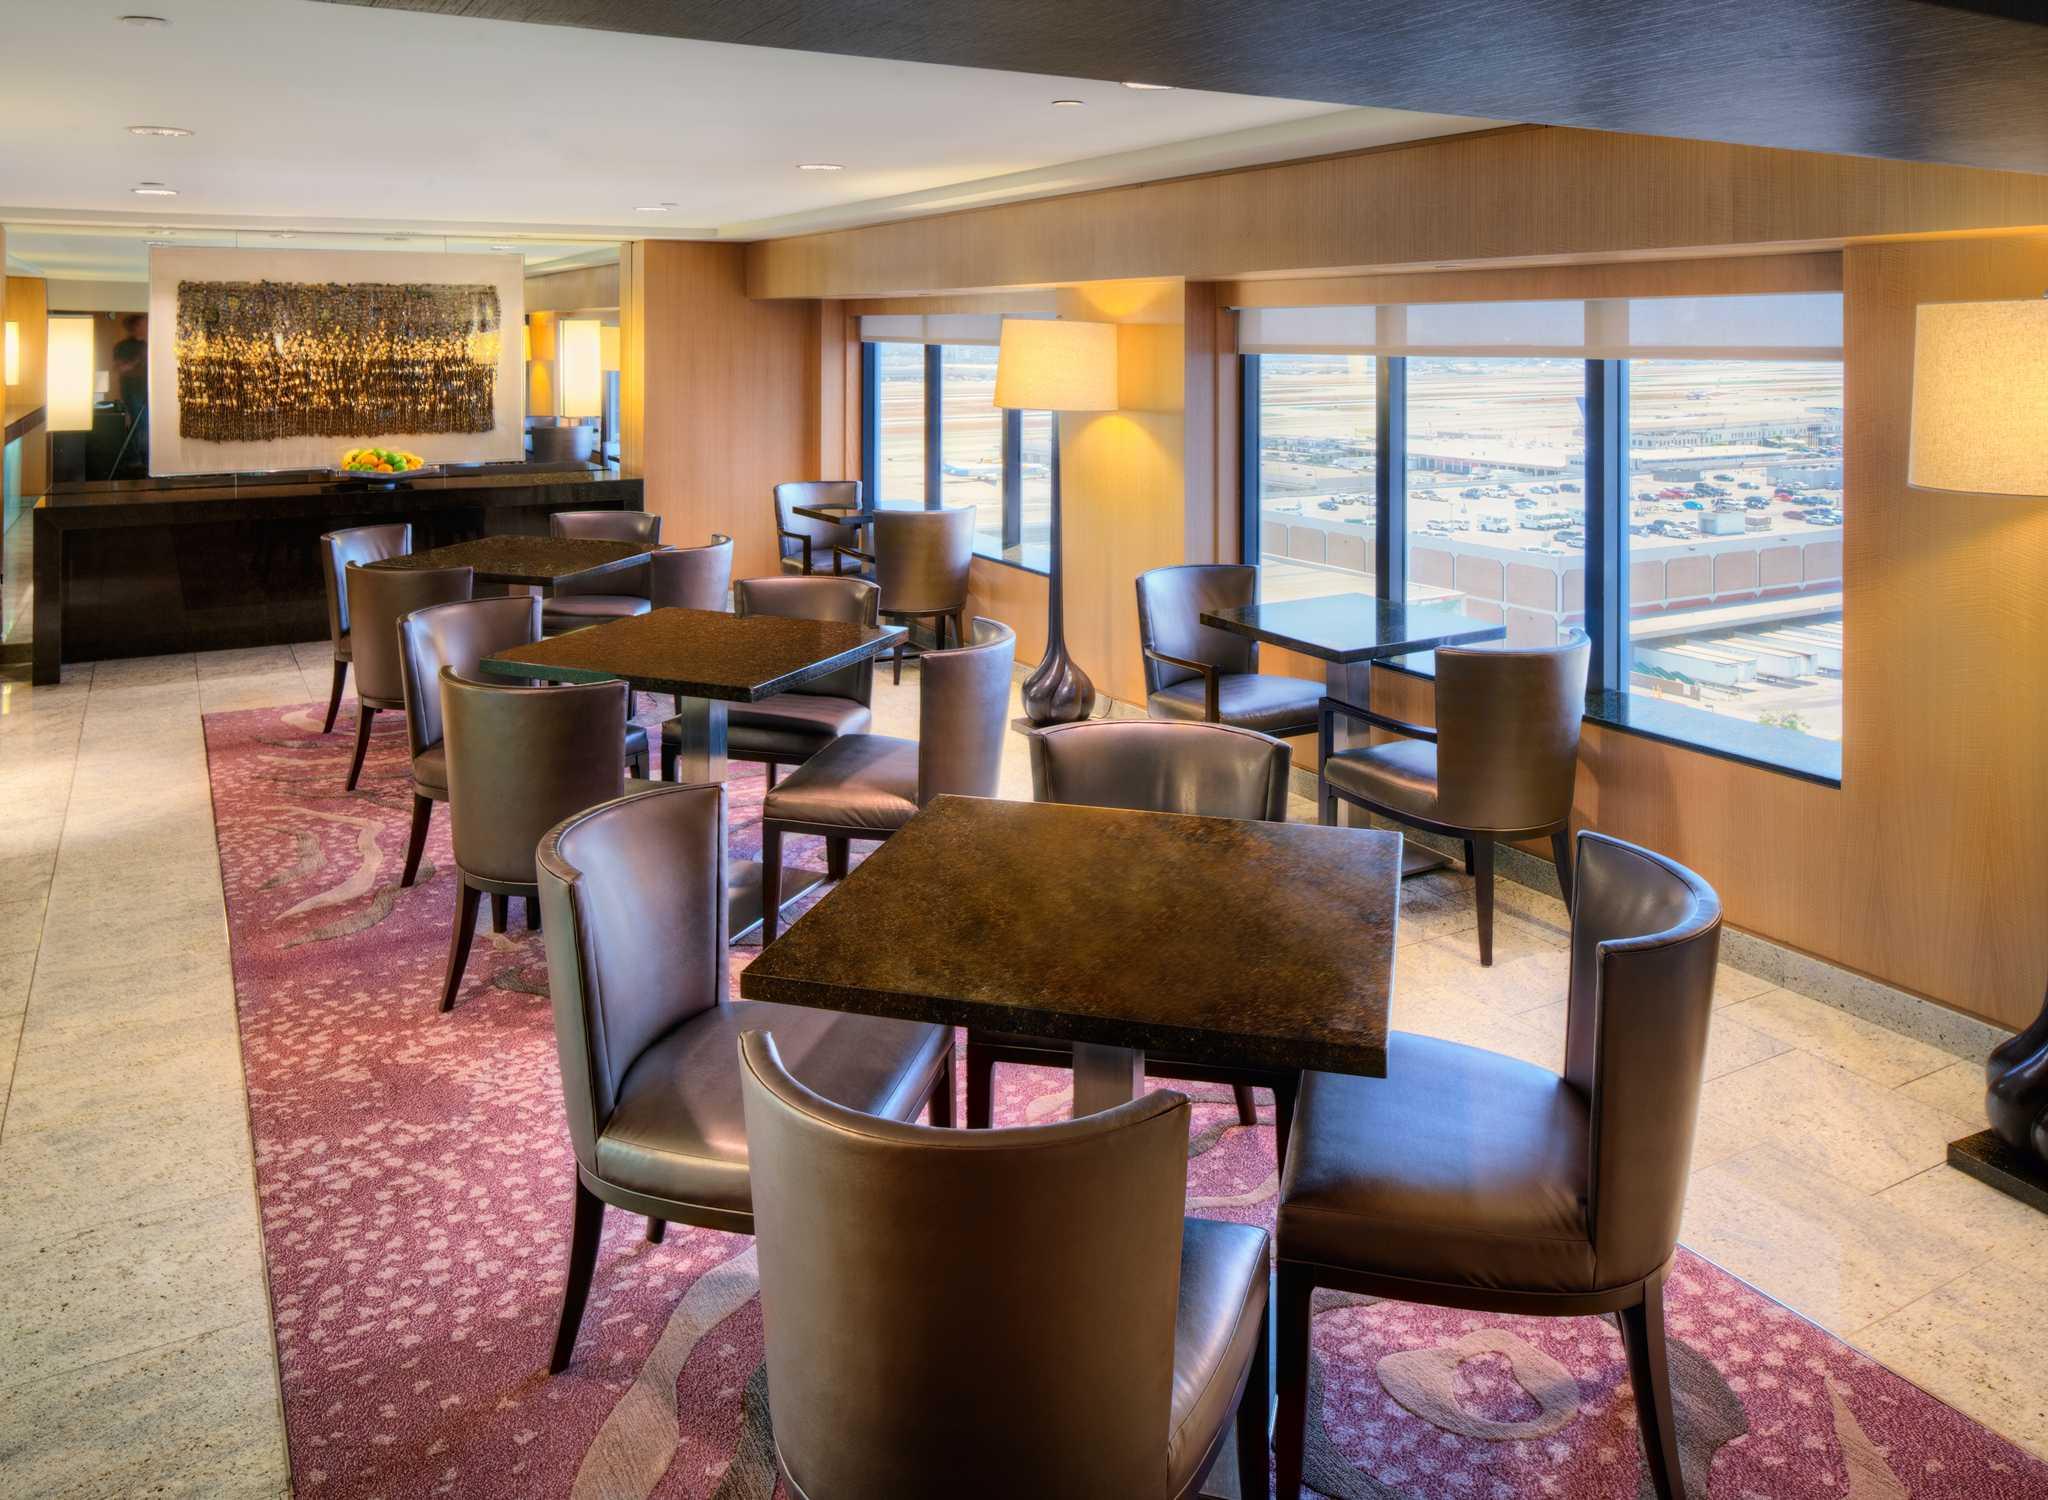 Lax Hotels Hilton Flughafenhotel Los Angeles